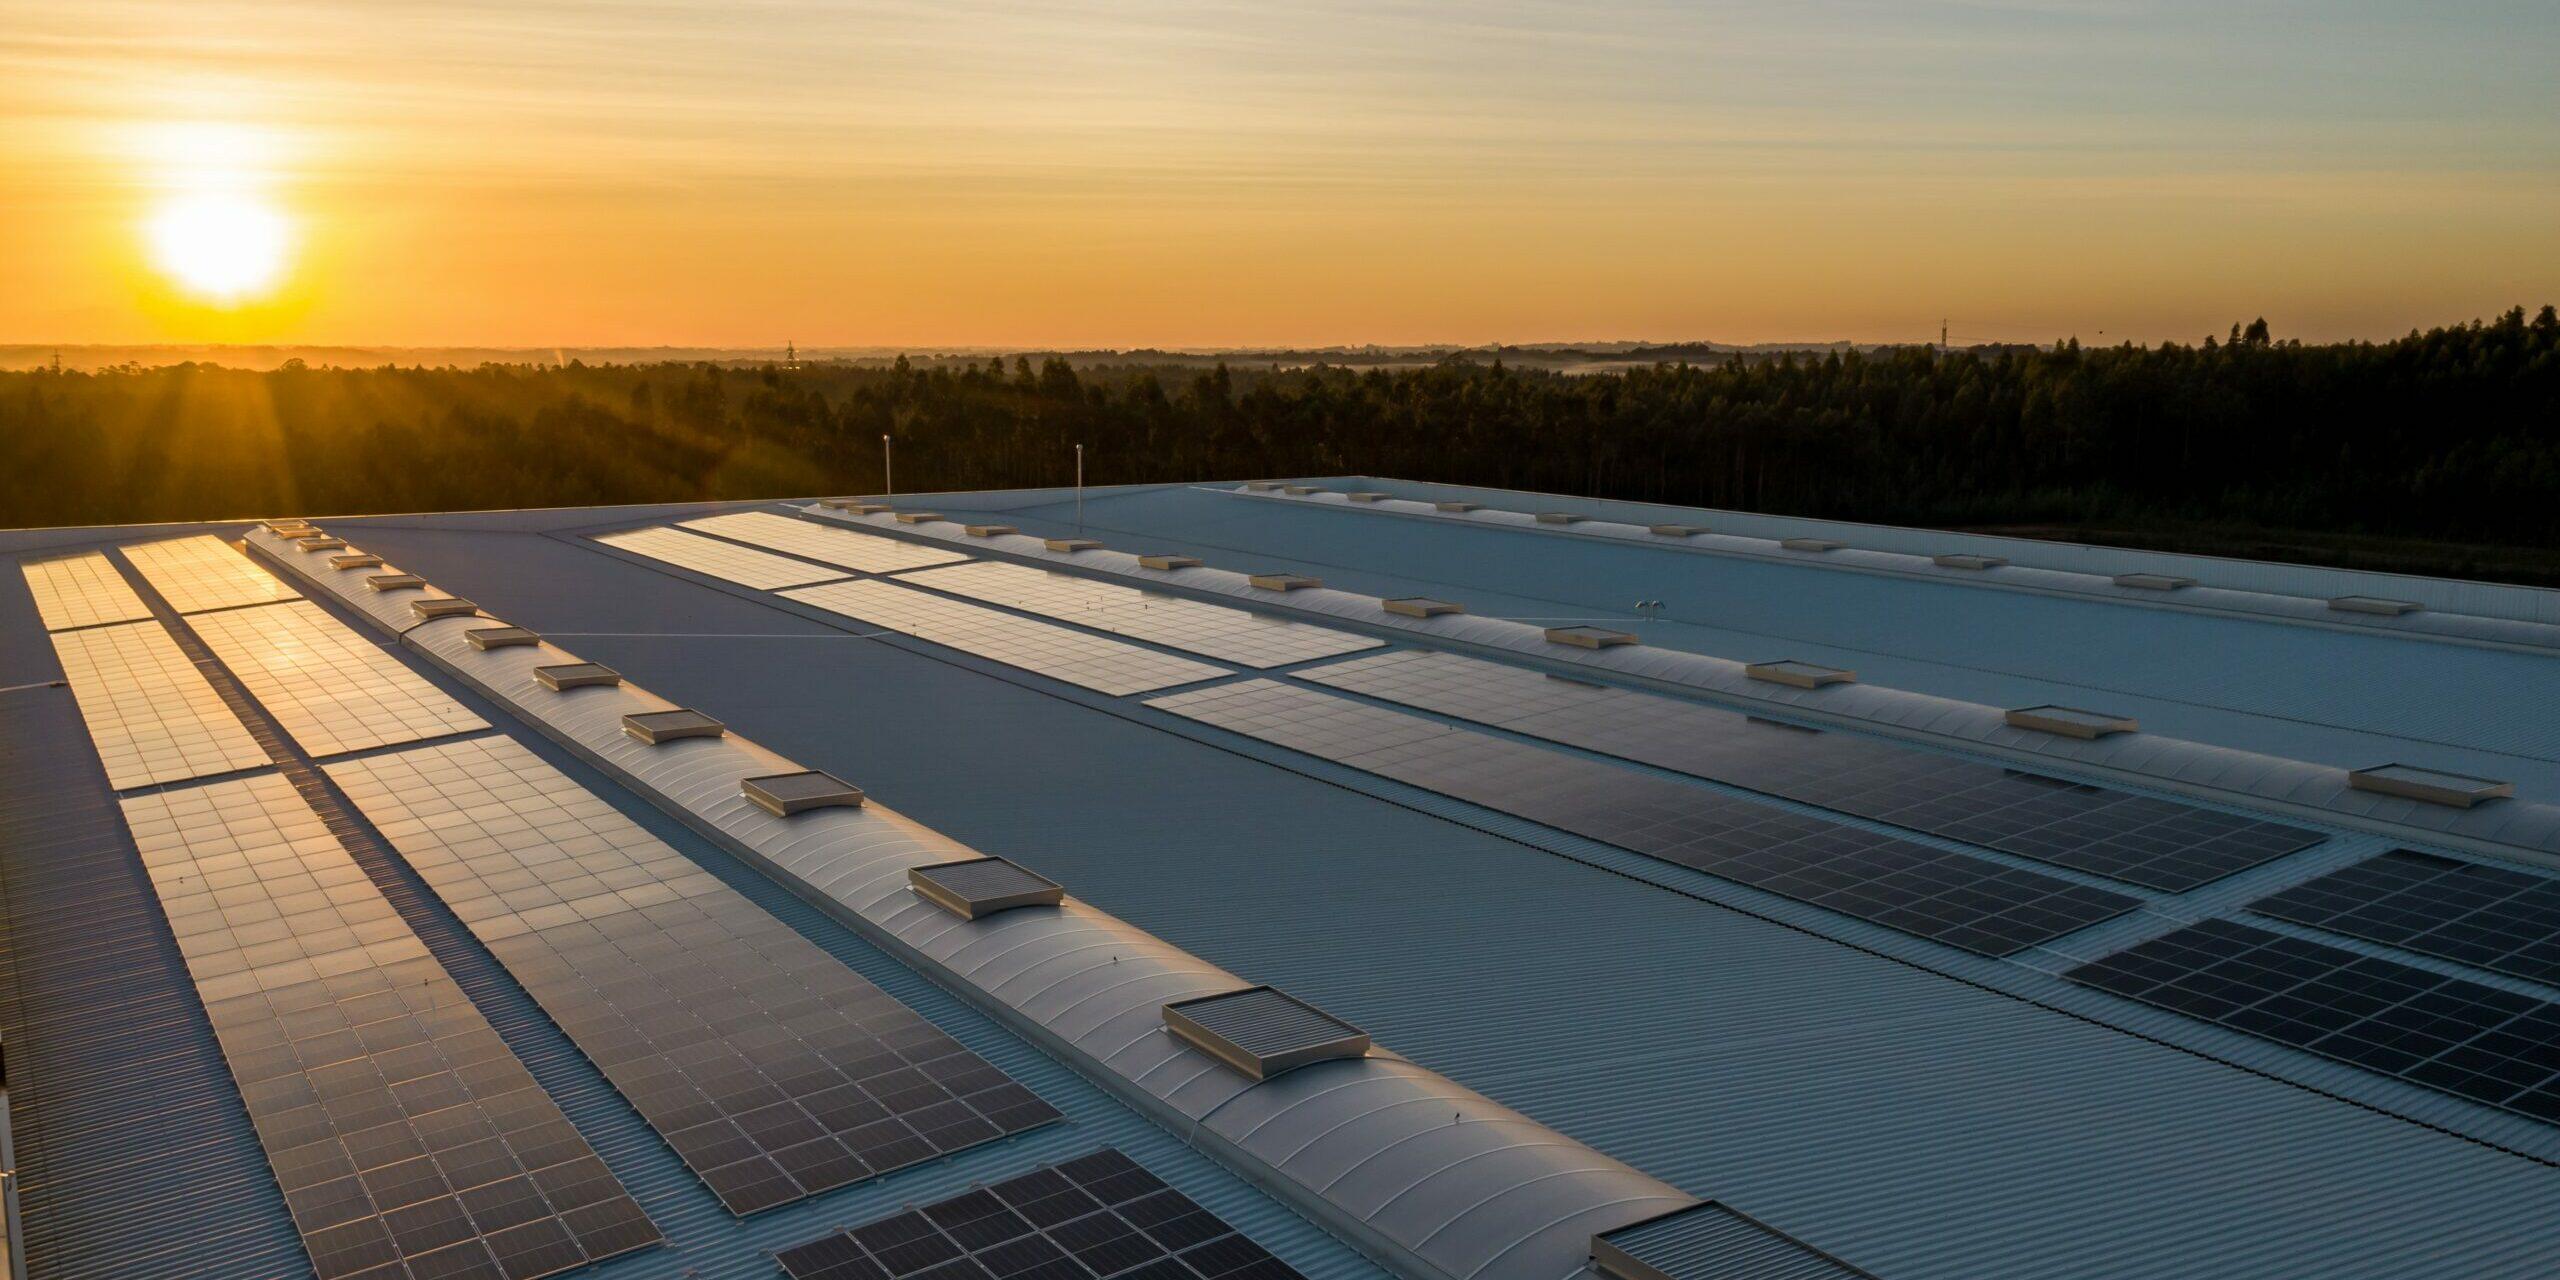 Photovoltaik Anlagen im Energieausweis